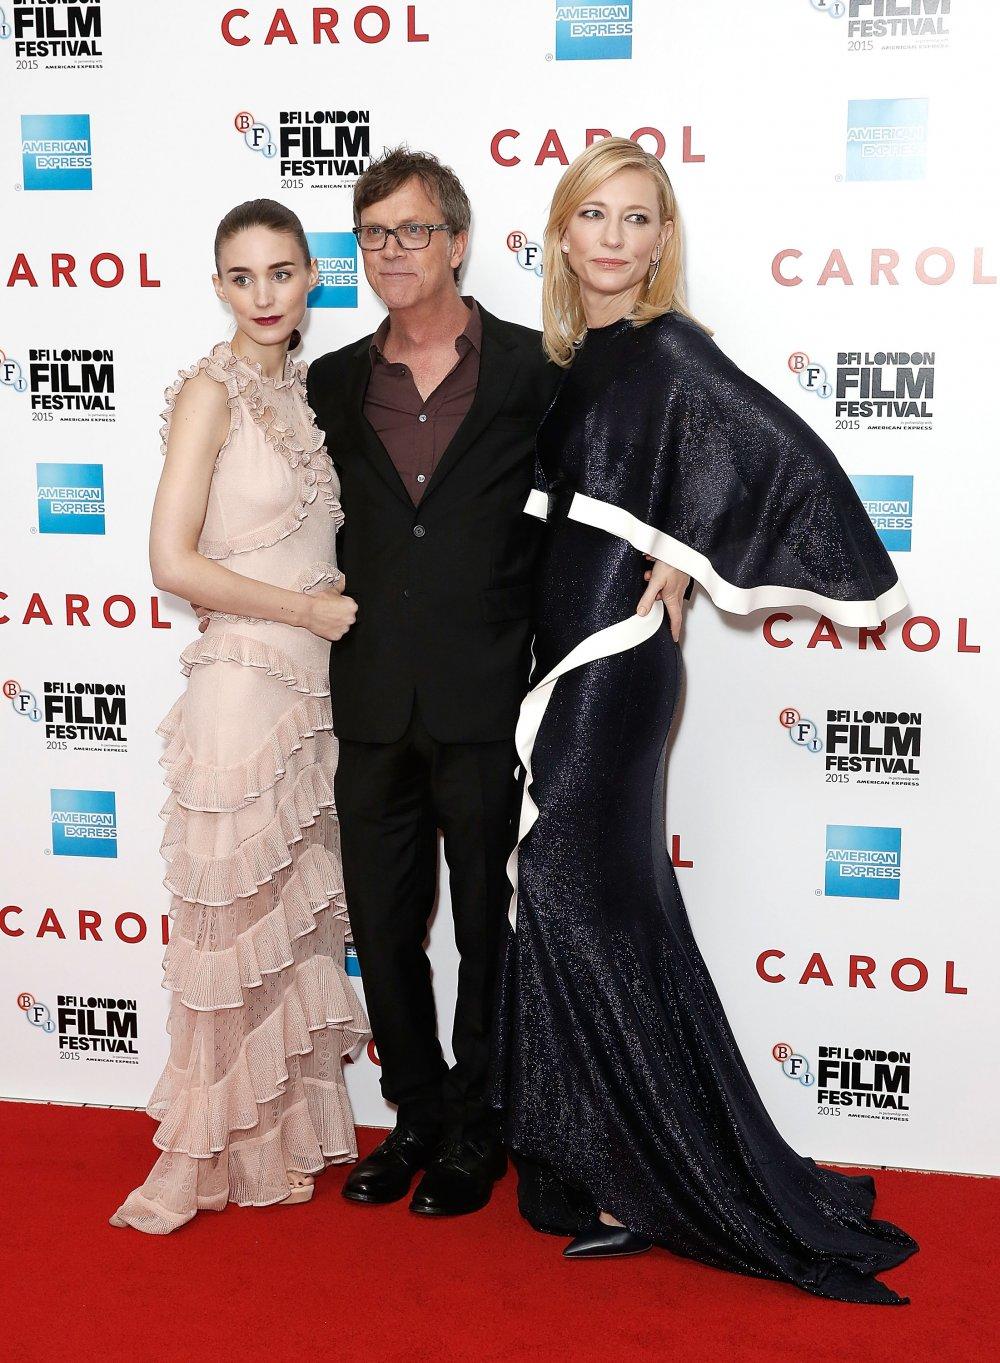 Rooney Mara, Todd Haynes and Cate Blanchett at the Carol America Express Gala